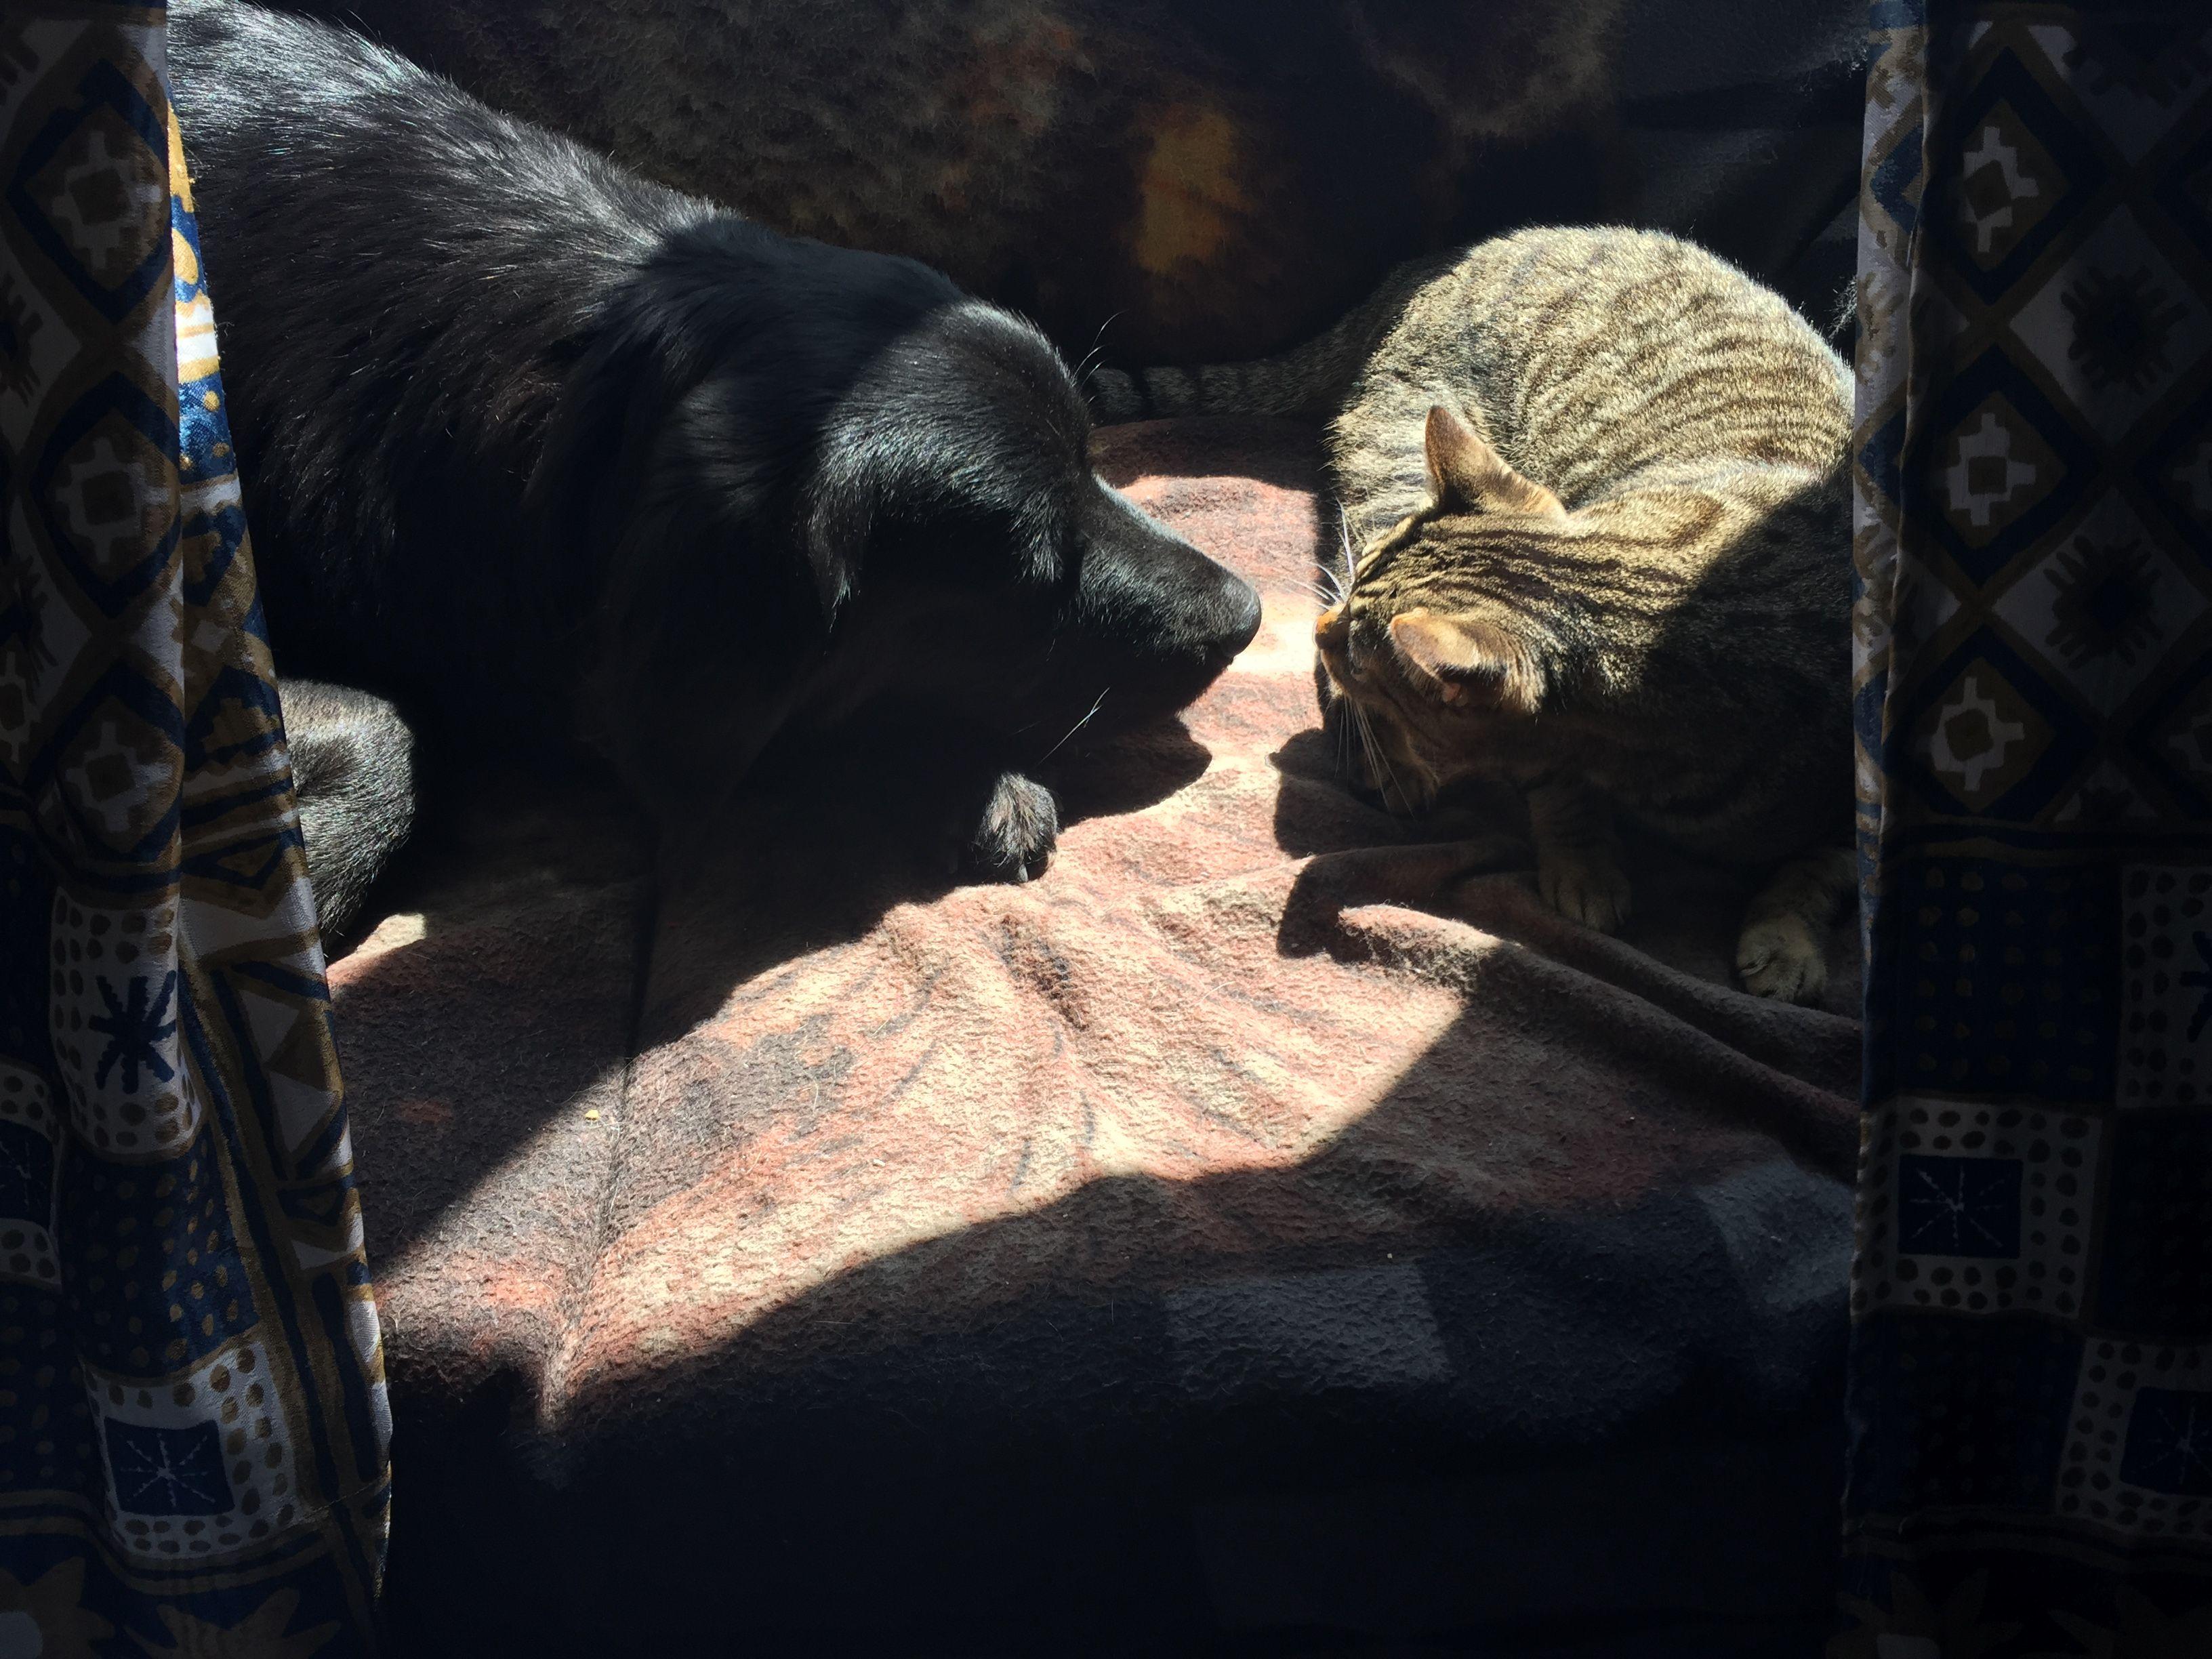 #Tom #Cat #Freya #Dog #Puppy # #LoveAnimals #CanaryIsland #GoldenRetriever #BlackGolden #BlackDog #MyMonster #Puppy #Pet